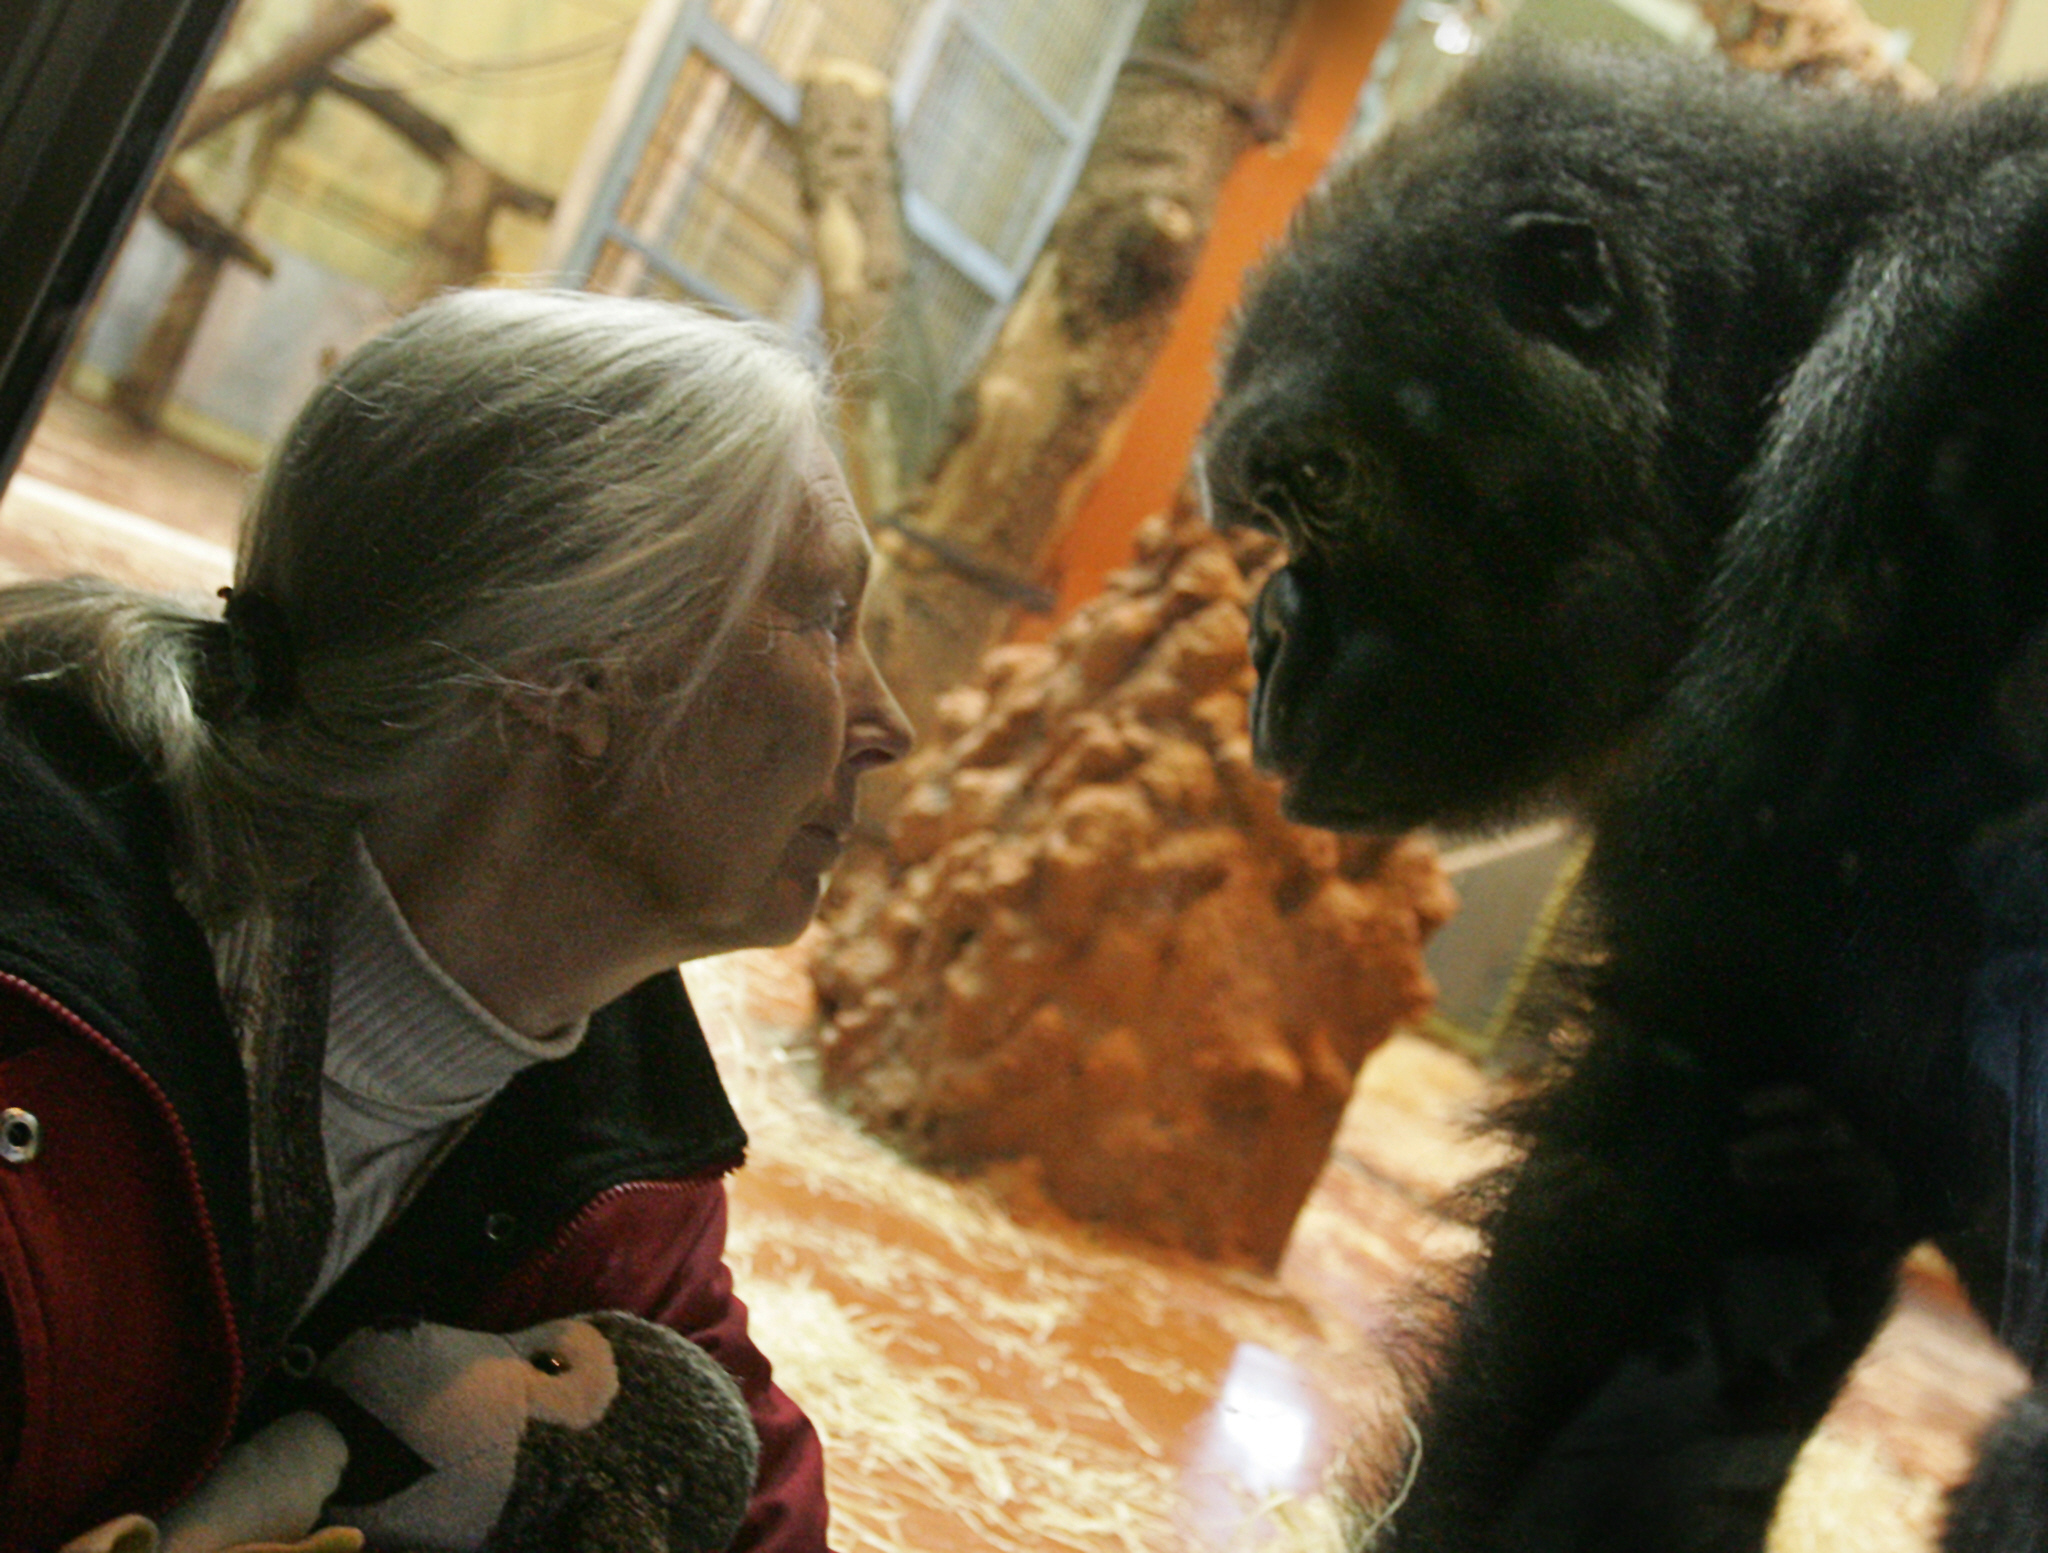 Jane Goodall: Cincinnati Zoo Had No Choice But to Kill Harambe the Gorilla